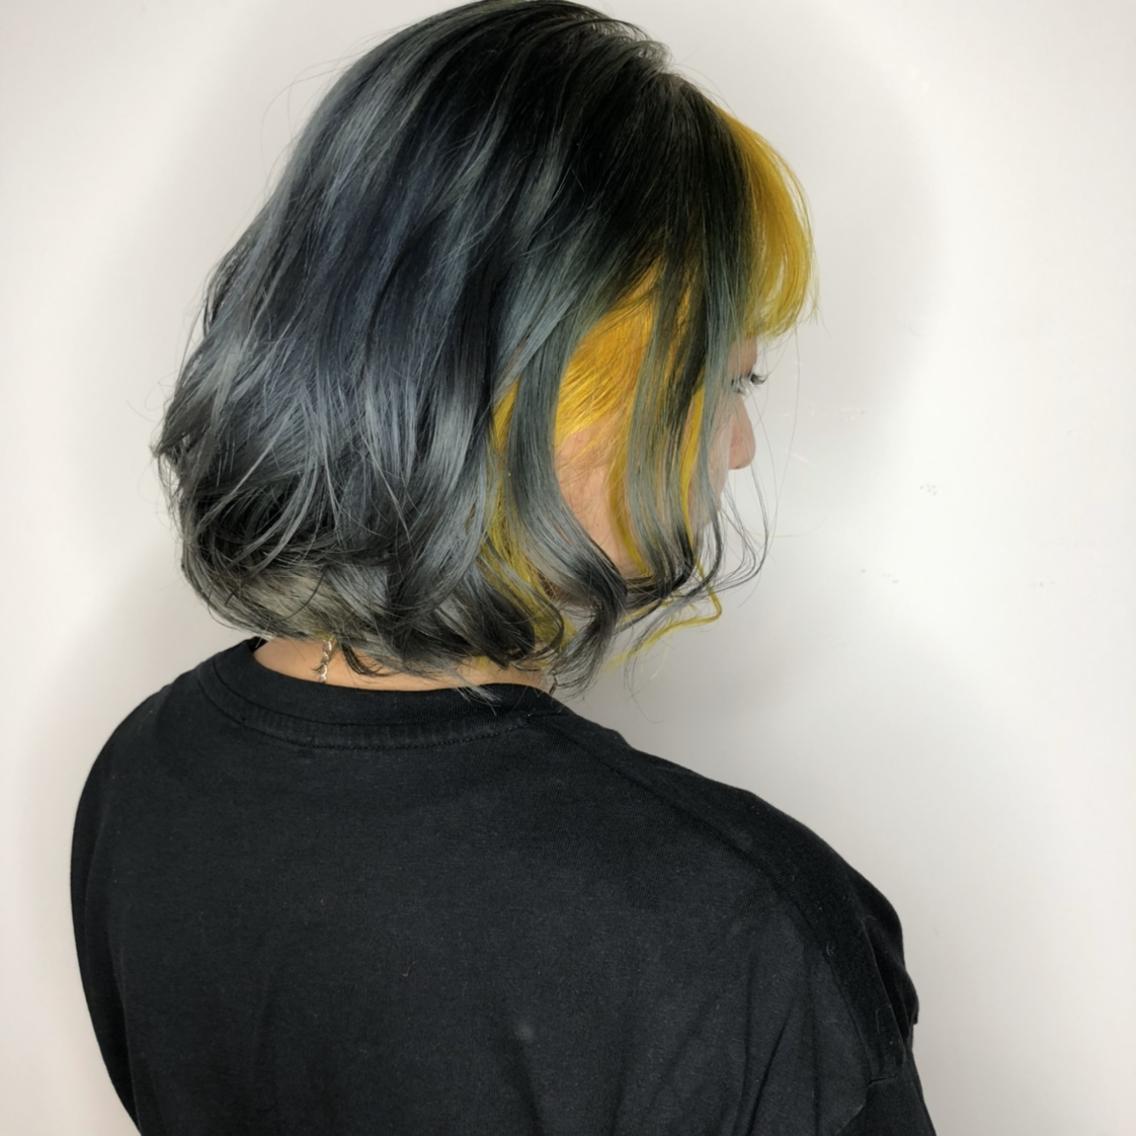 HAIR&MAKE EARTH志木店所属・EARTH 志木店の掲載